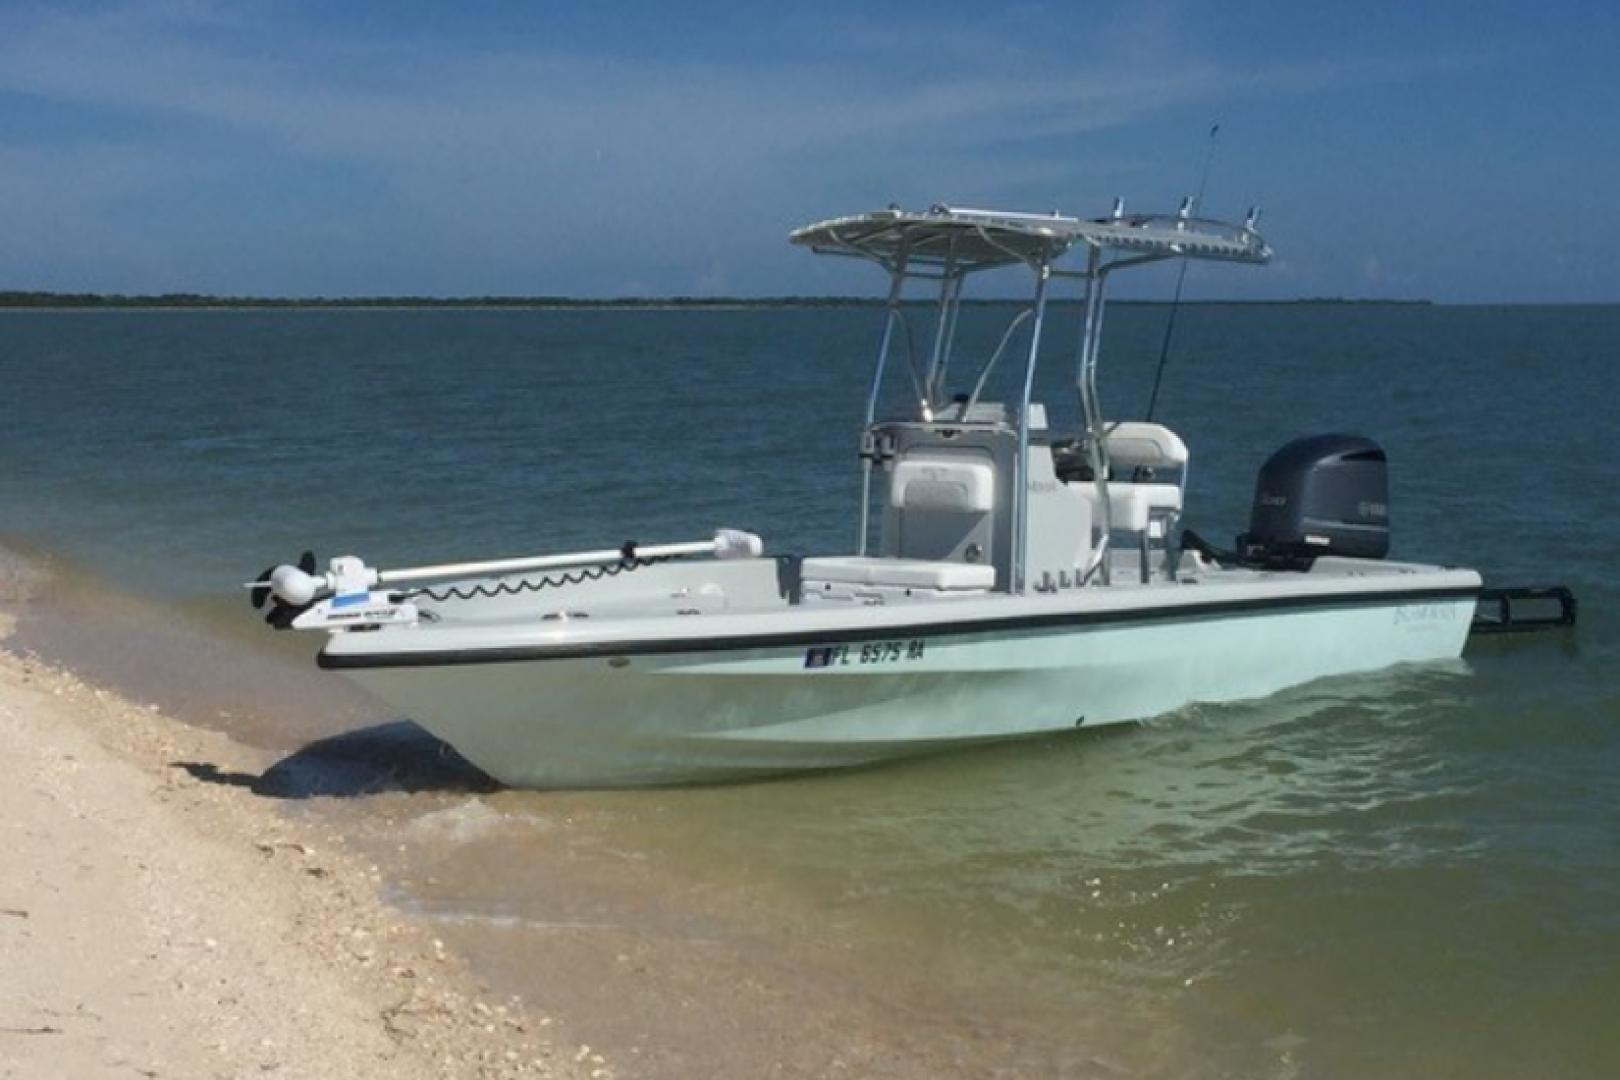 Islamorada Boatworks-Morada 24 2016-No Name Islamorada-Florida-United States-2016 24 Islamorada Boatworks Morada 24-1601985 | Thumbnail